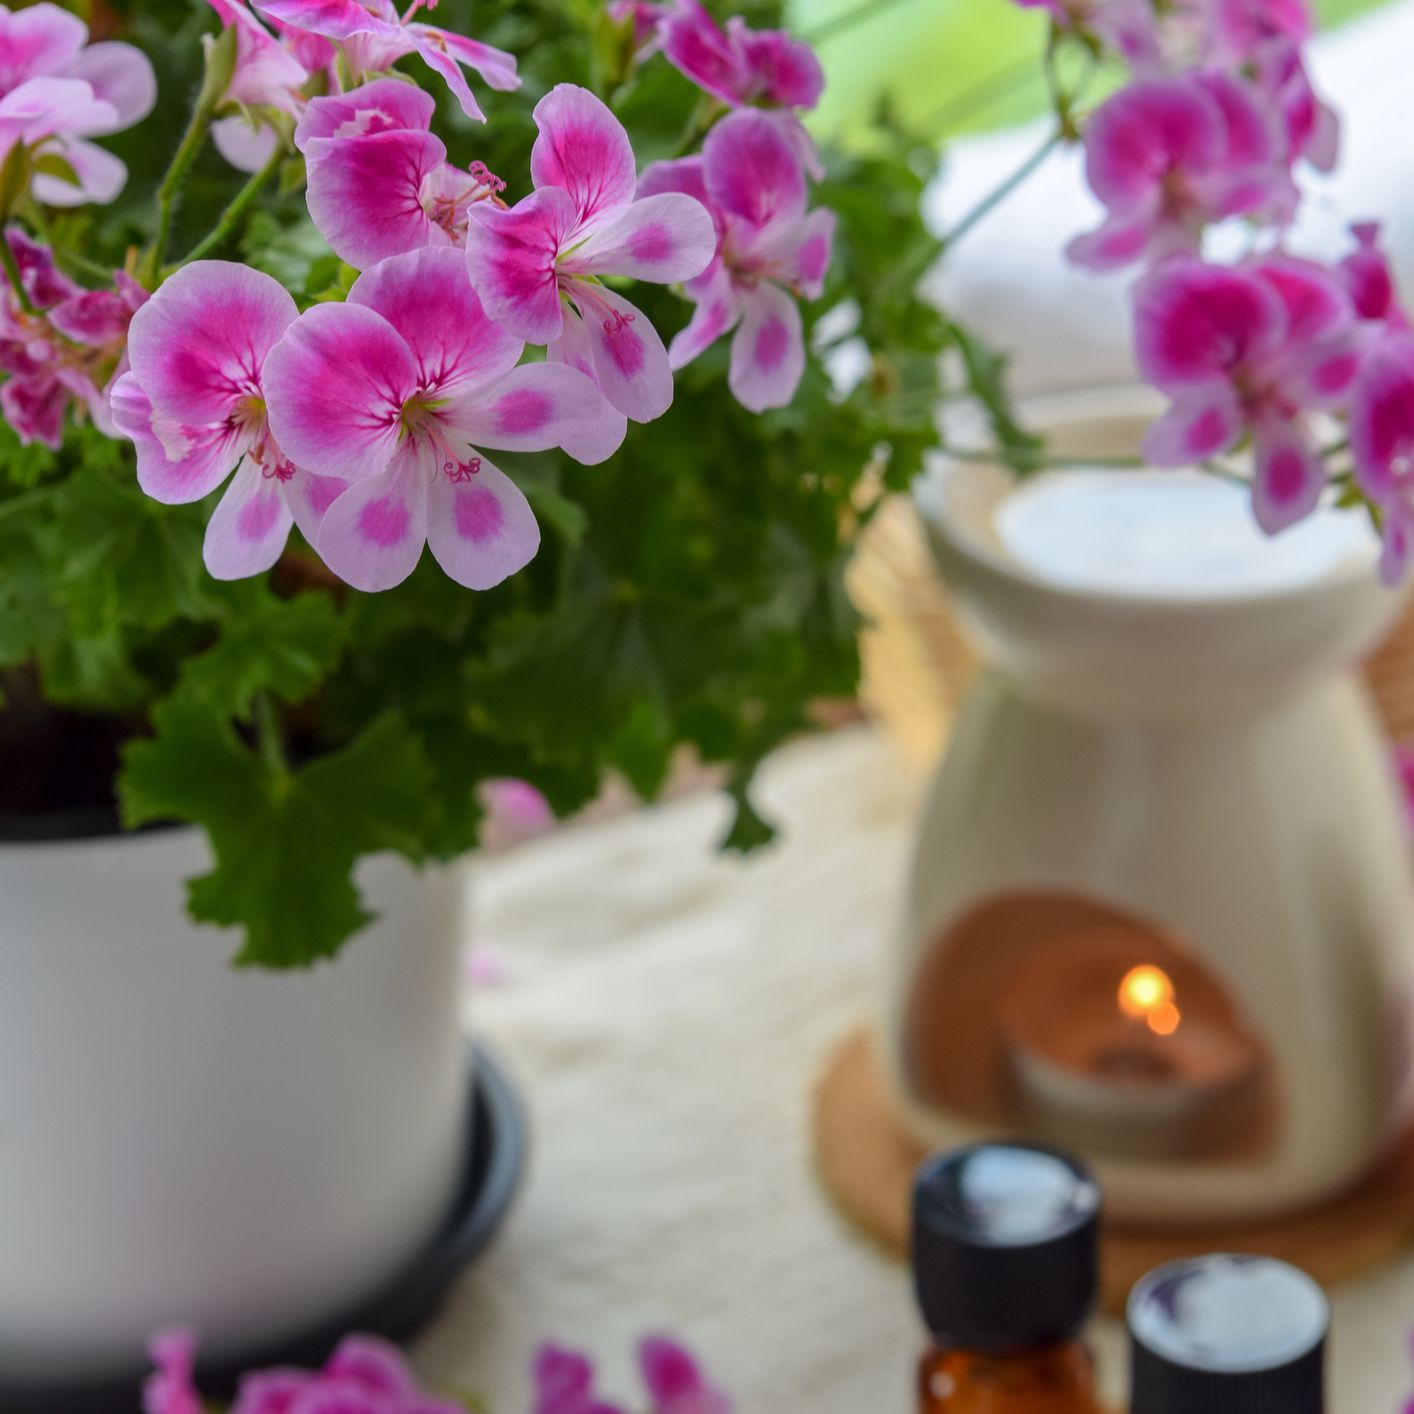 essential oils with rose geranium flowers at spa salon